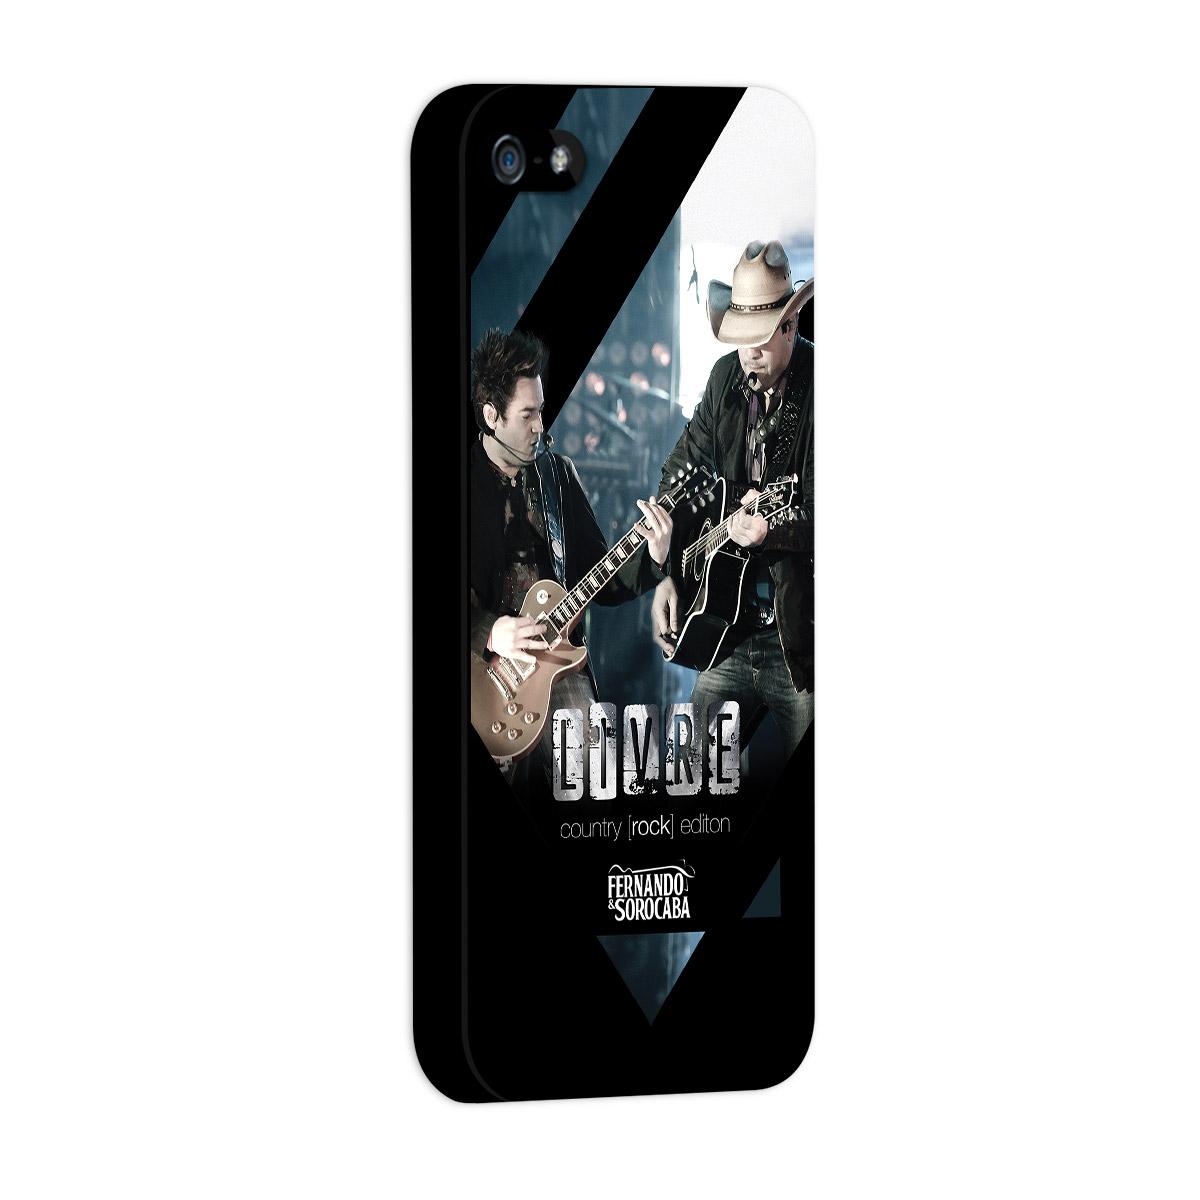 Capa de iPhone 5/5S Fernando e Sorocaba Livre Modelo 2